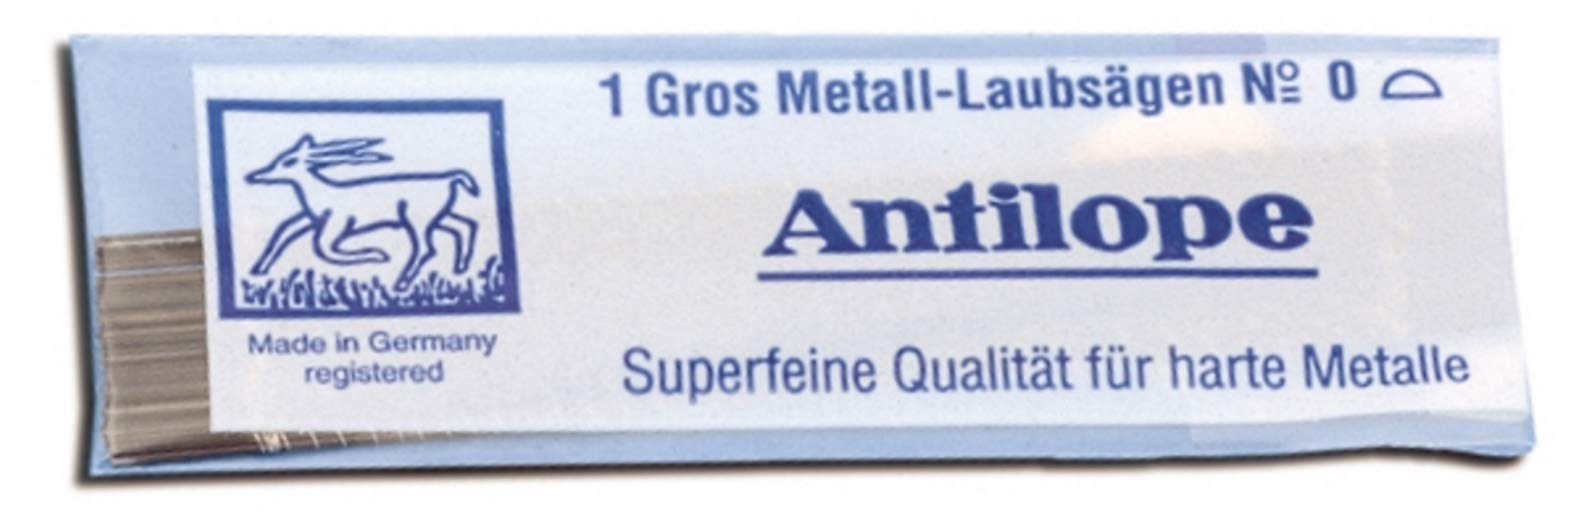 Metalworking Jewelers Sawblades Pack of 144 Antilope Blue #4/0 by Grobet USA